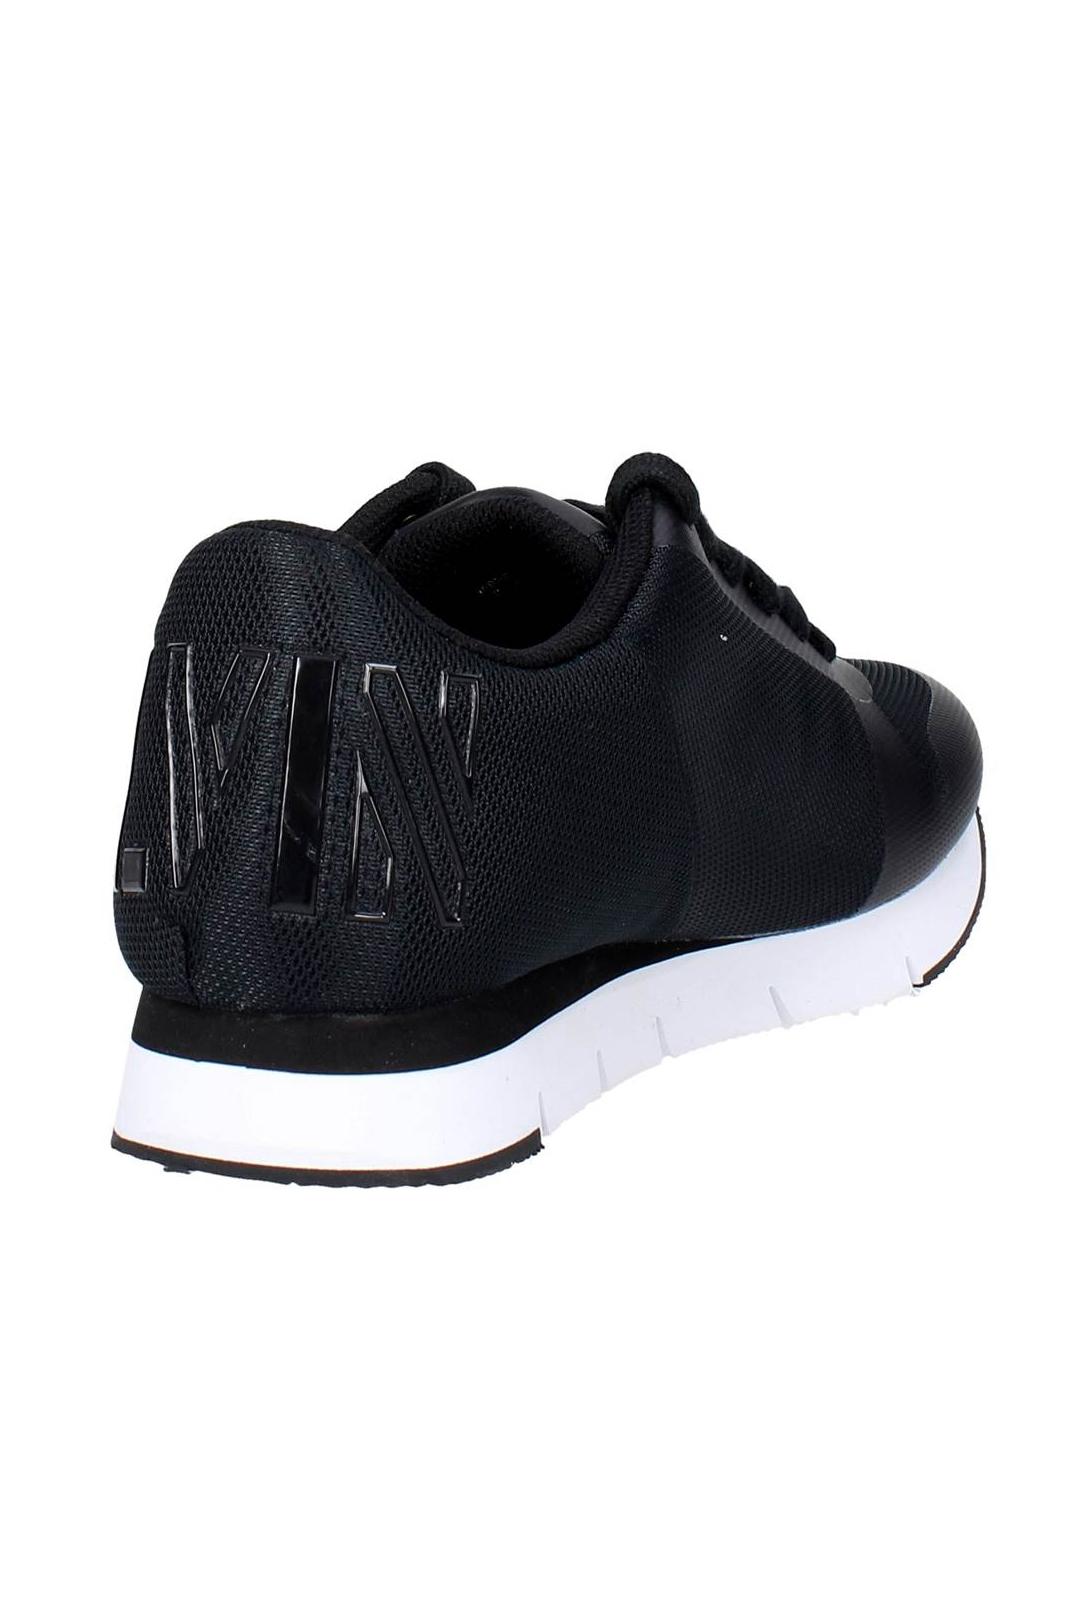 Baskets / Sport  Calvin klein JABRE MESH BLACK/BLACK